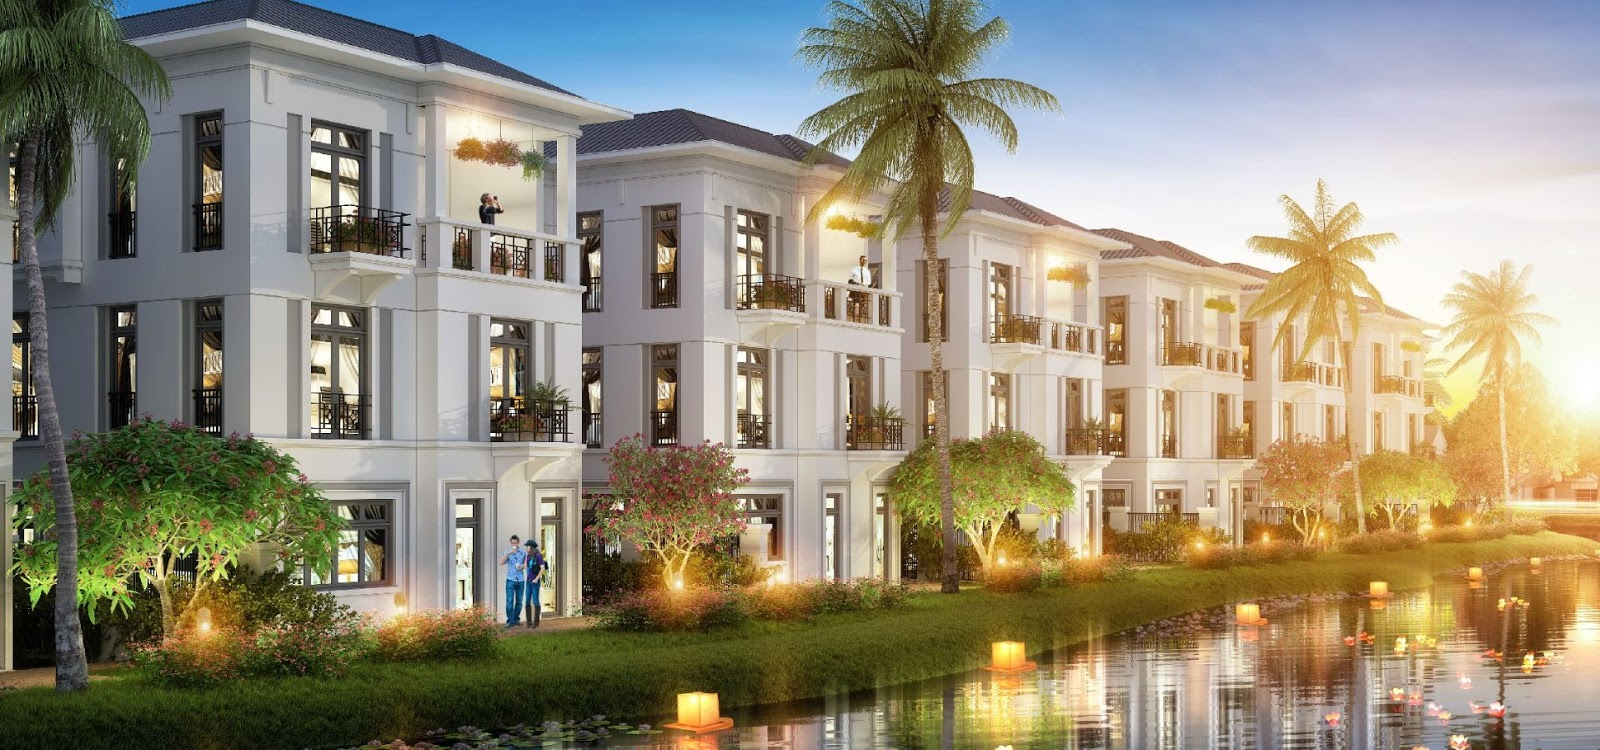 biệt thự sunshine mystery villas